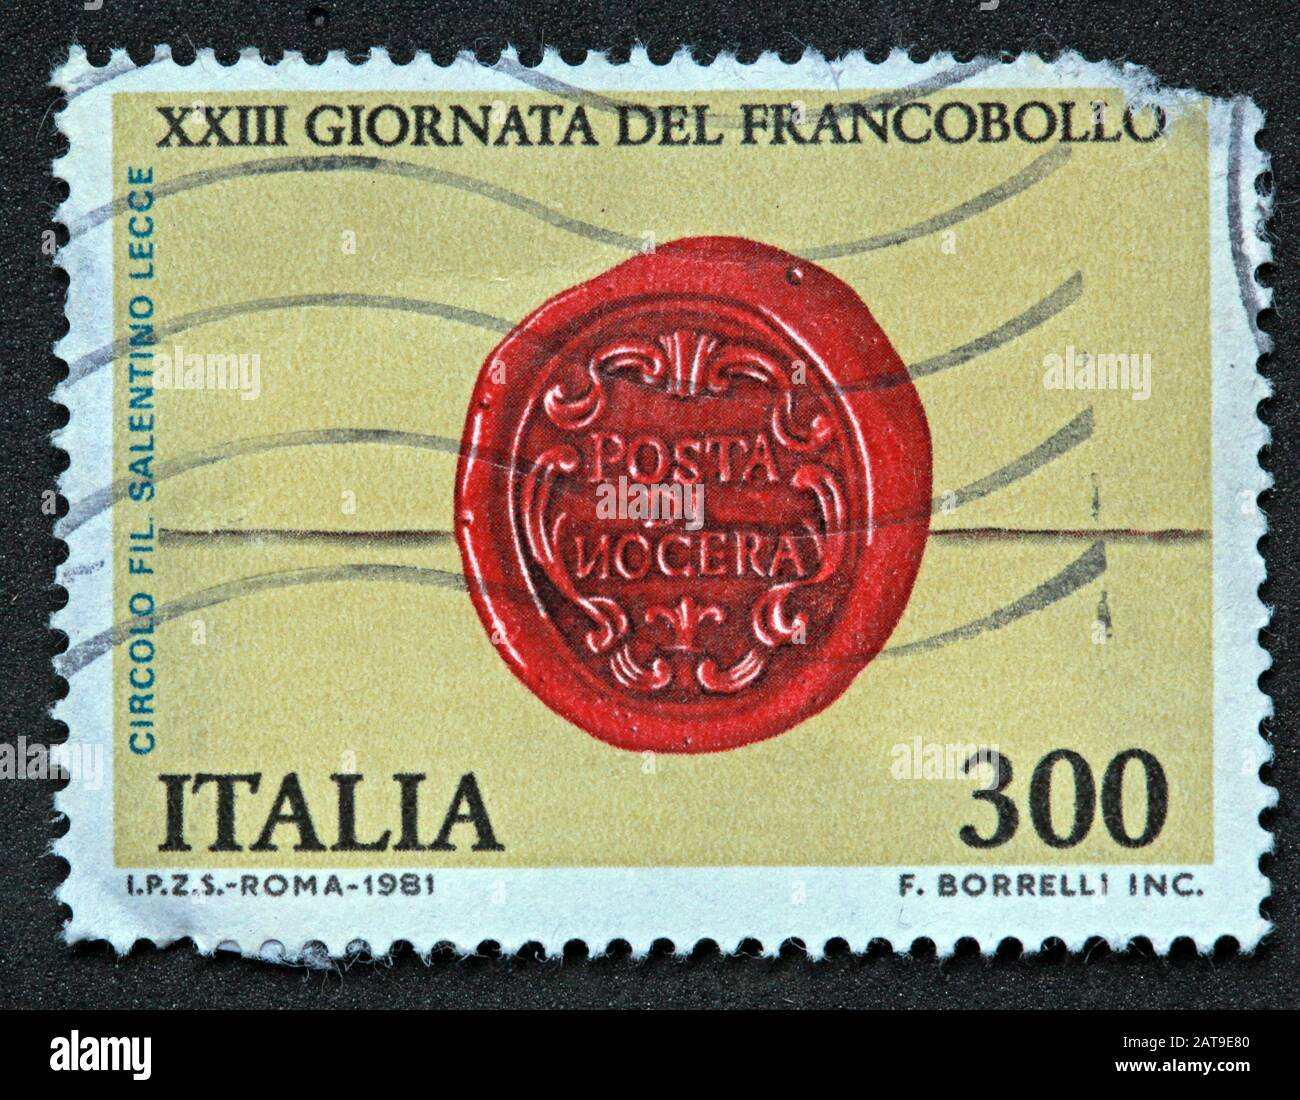 Dieses Stockfoto: Italienische Briefmarke, poste Italia verwendete und frankierte Briefmarke, Italia 300lire Roma 1981 f. Borrelli Inc. - XXIII Giornata Del Francobollo - 2AT9E8